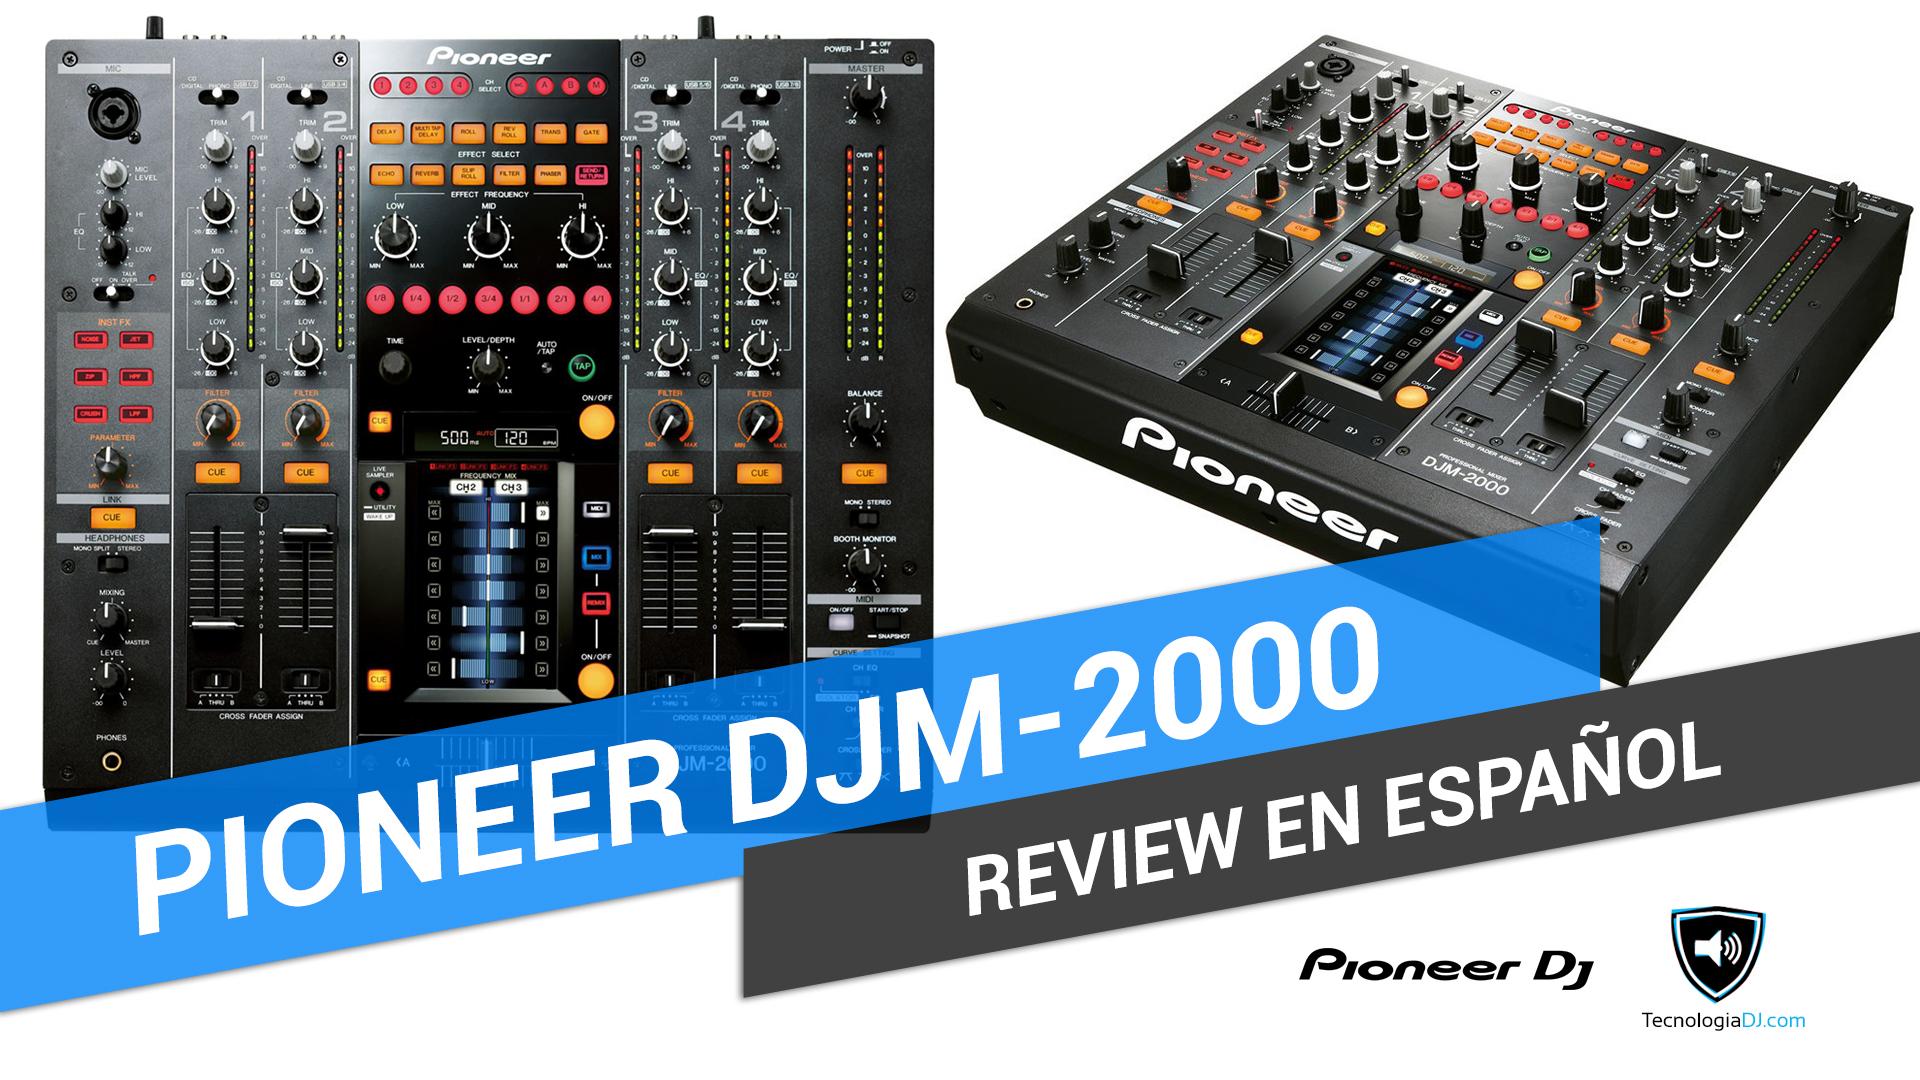 Review en español mixer Pioneer DJM-2000